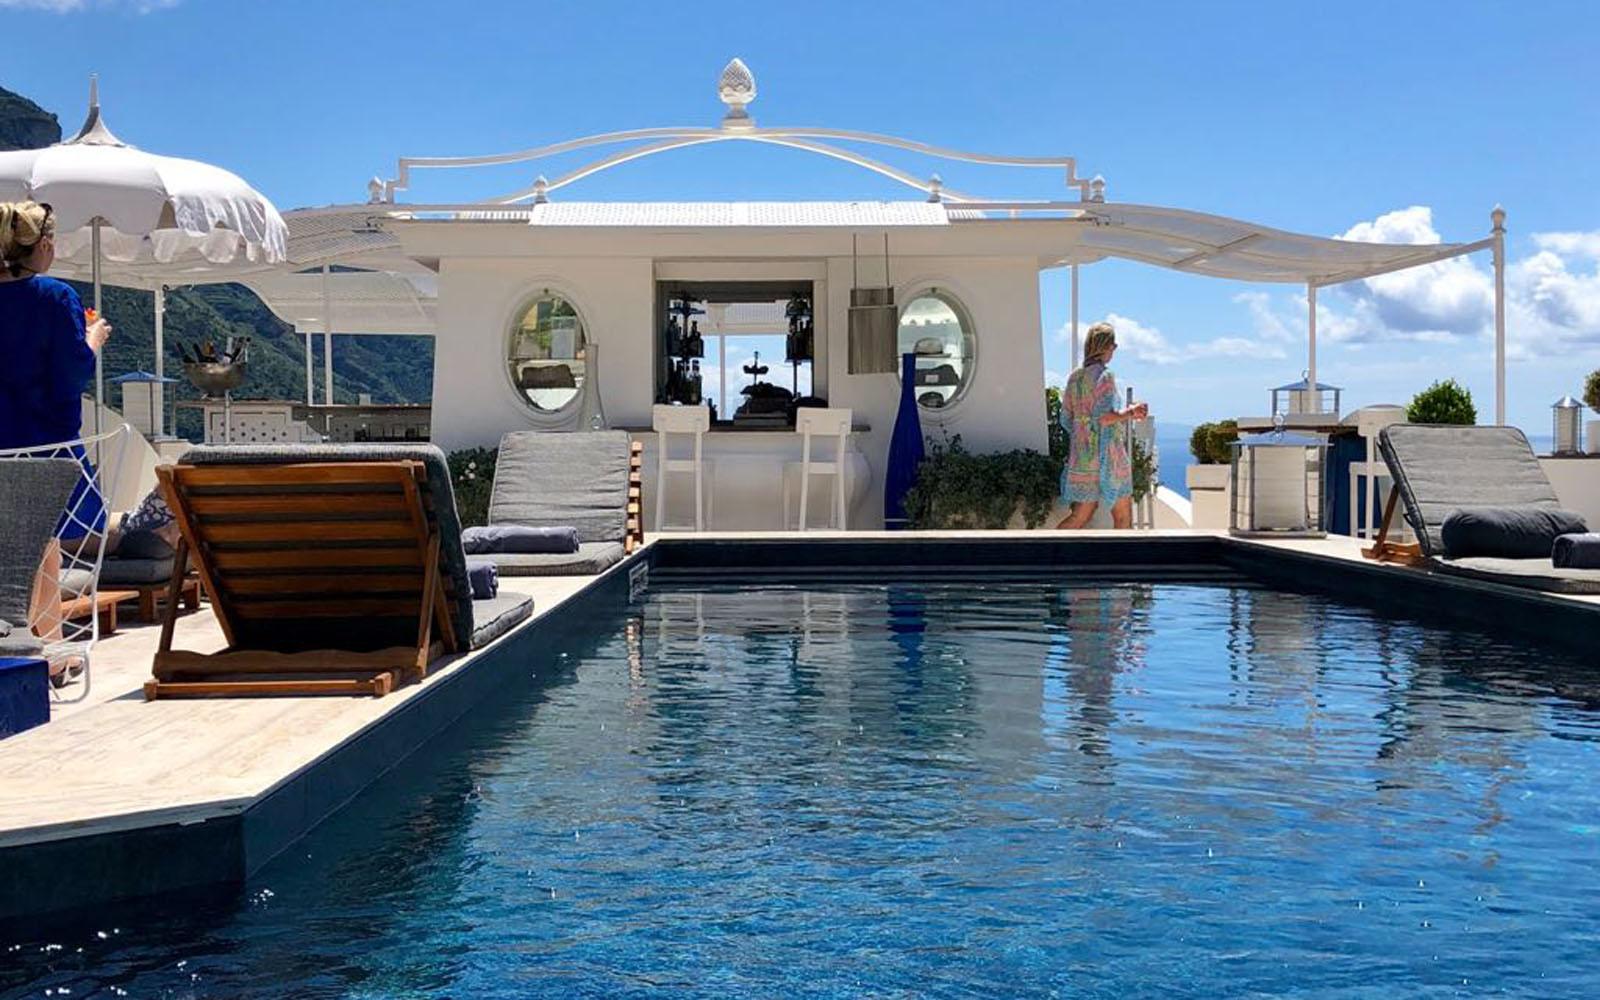 Pool at Day - Hotel Villa Franca